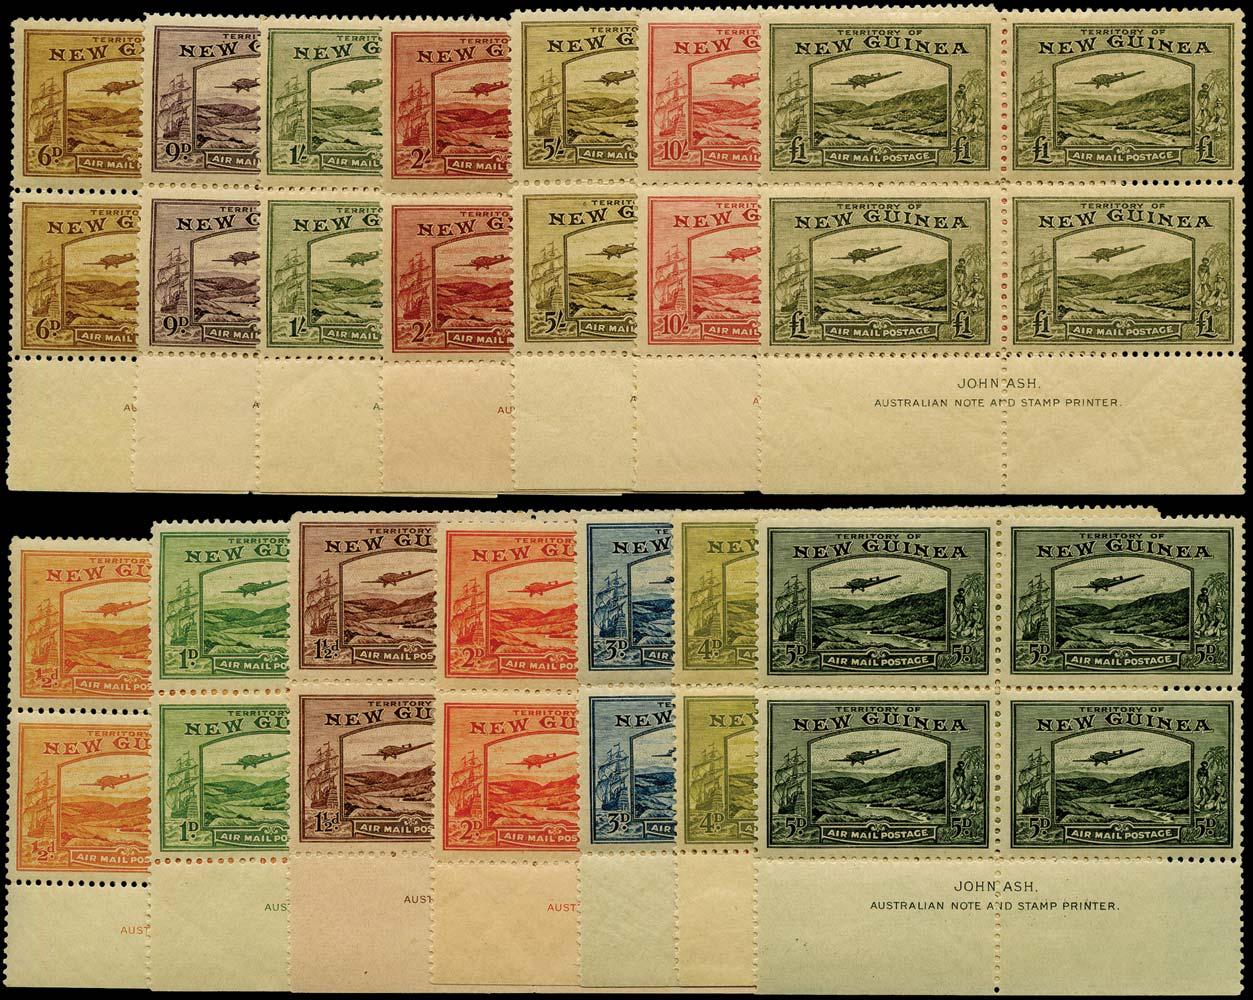 NEW GUINEA 1939  SG212/25 Mint Bulolo Goldfields Airmail set of imprint blocks